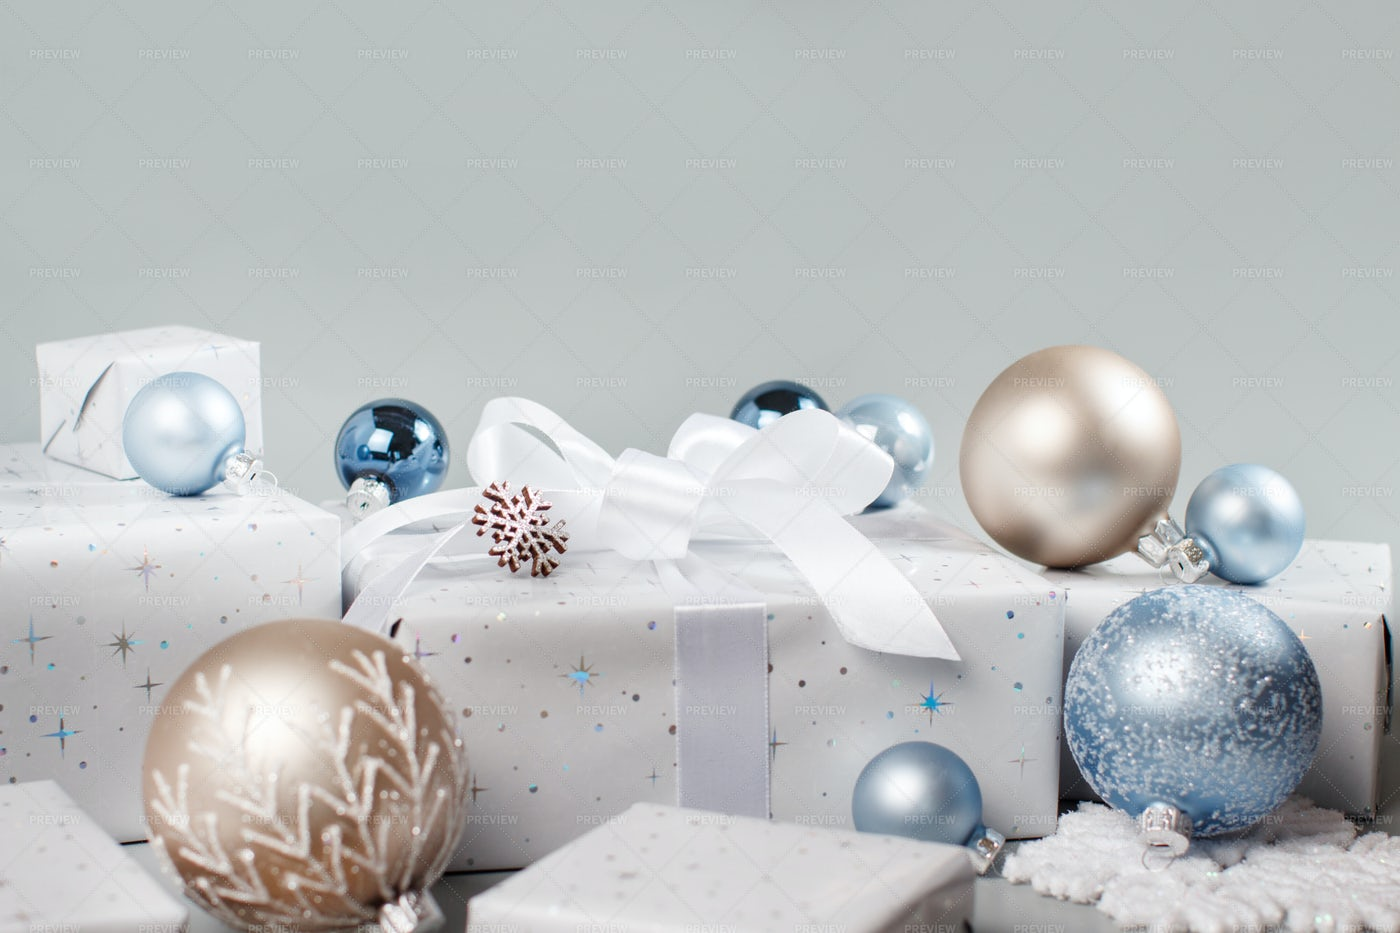 Christmas Composition On Grey: Stock Photos